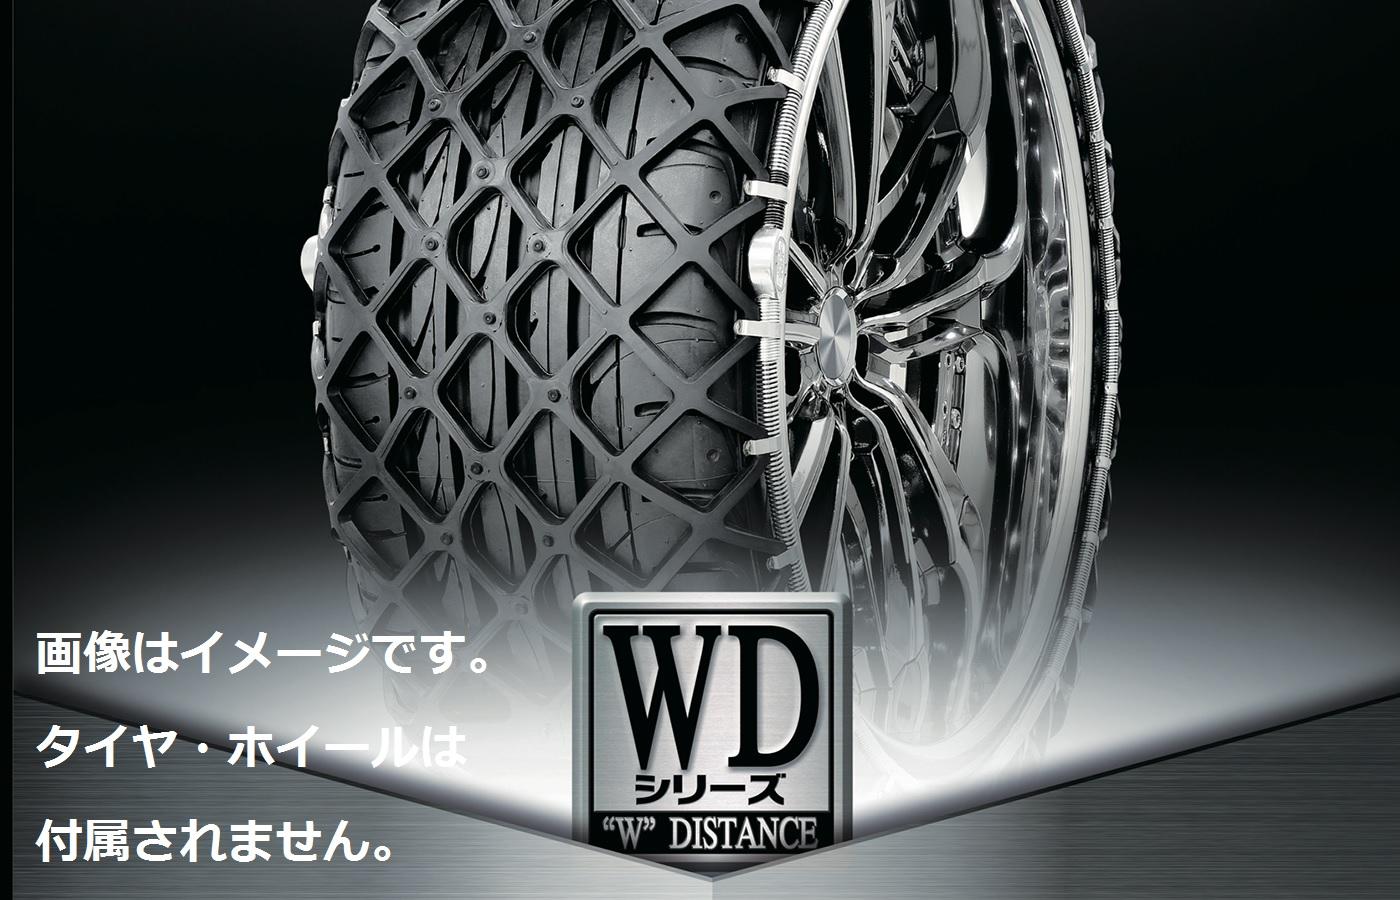 ★□ Yeti Snow net / イエティスノーネット 【非金属スノーネット】 2309WD